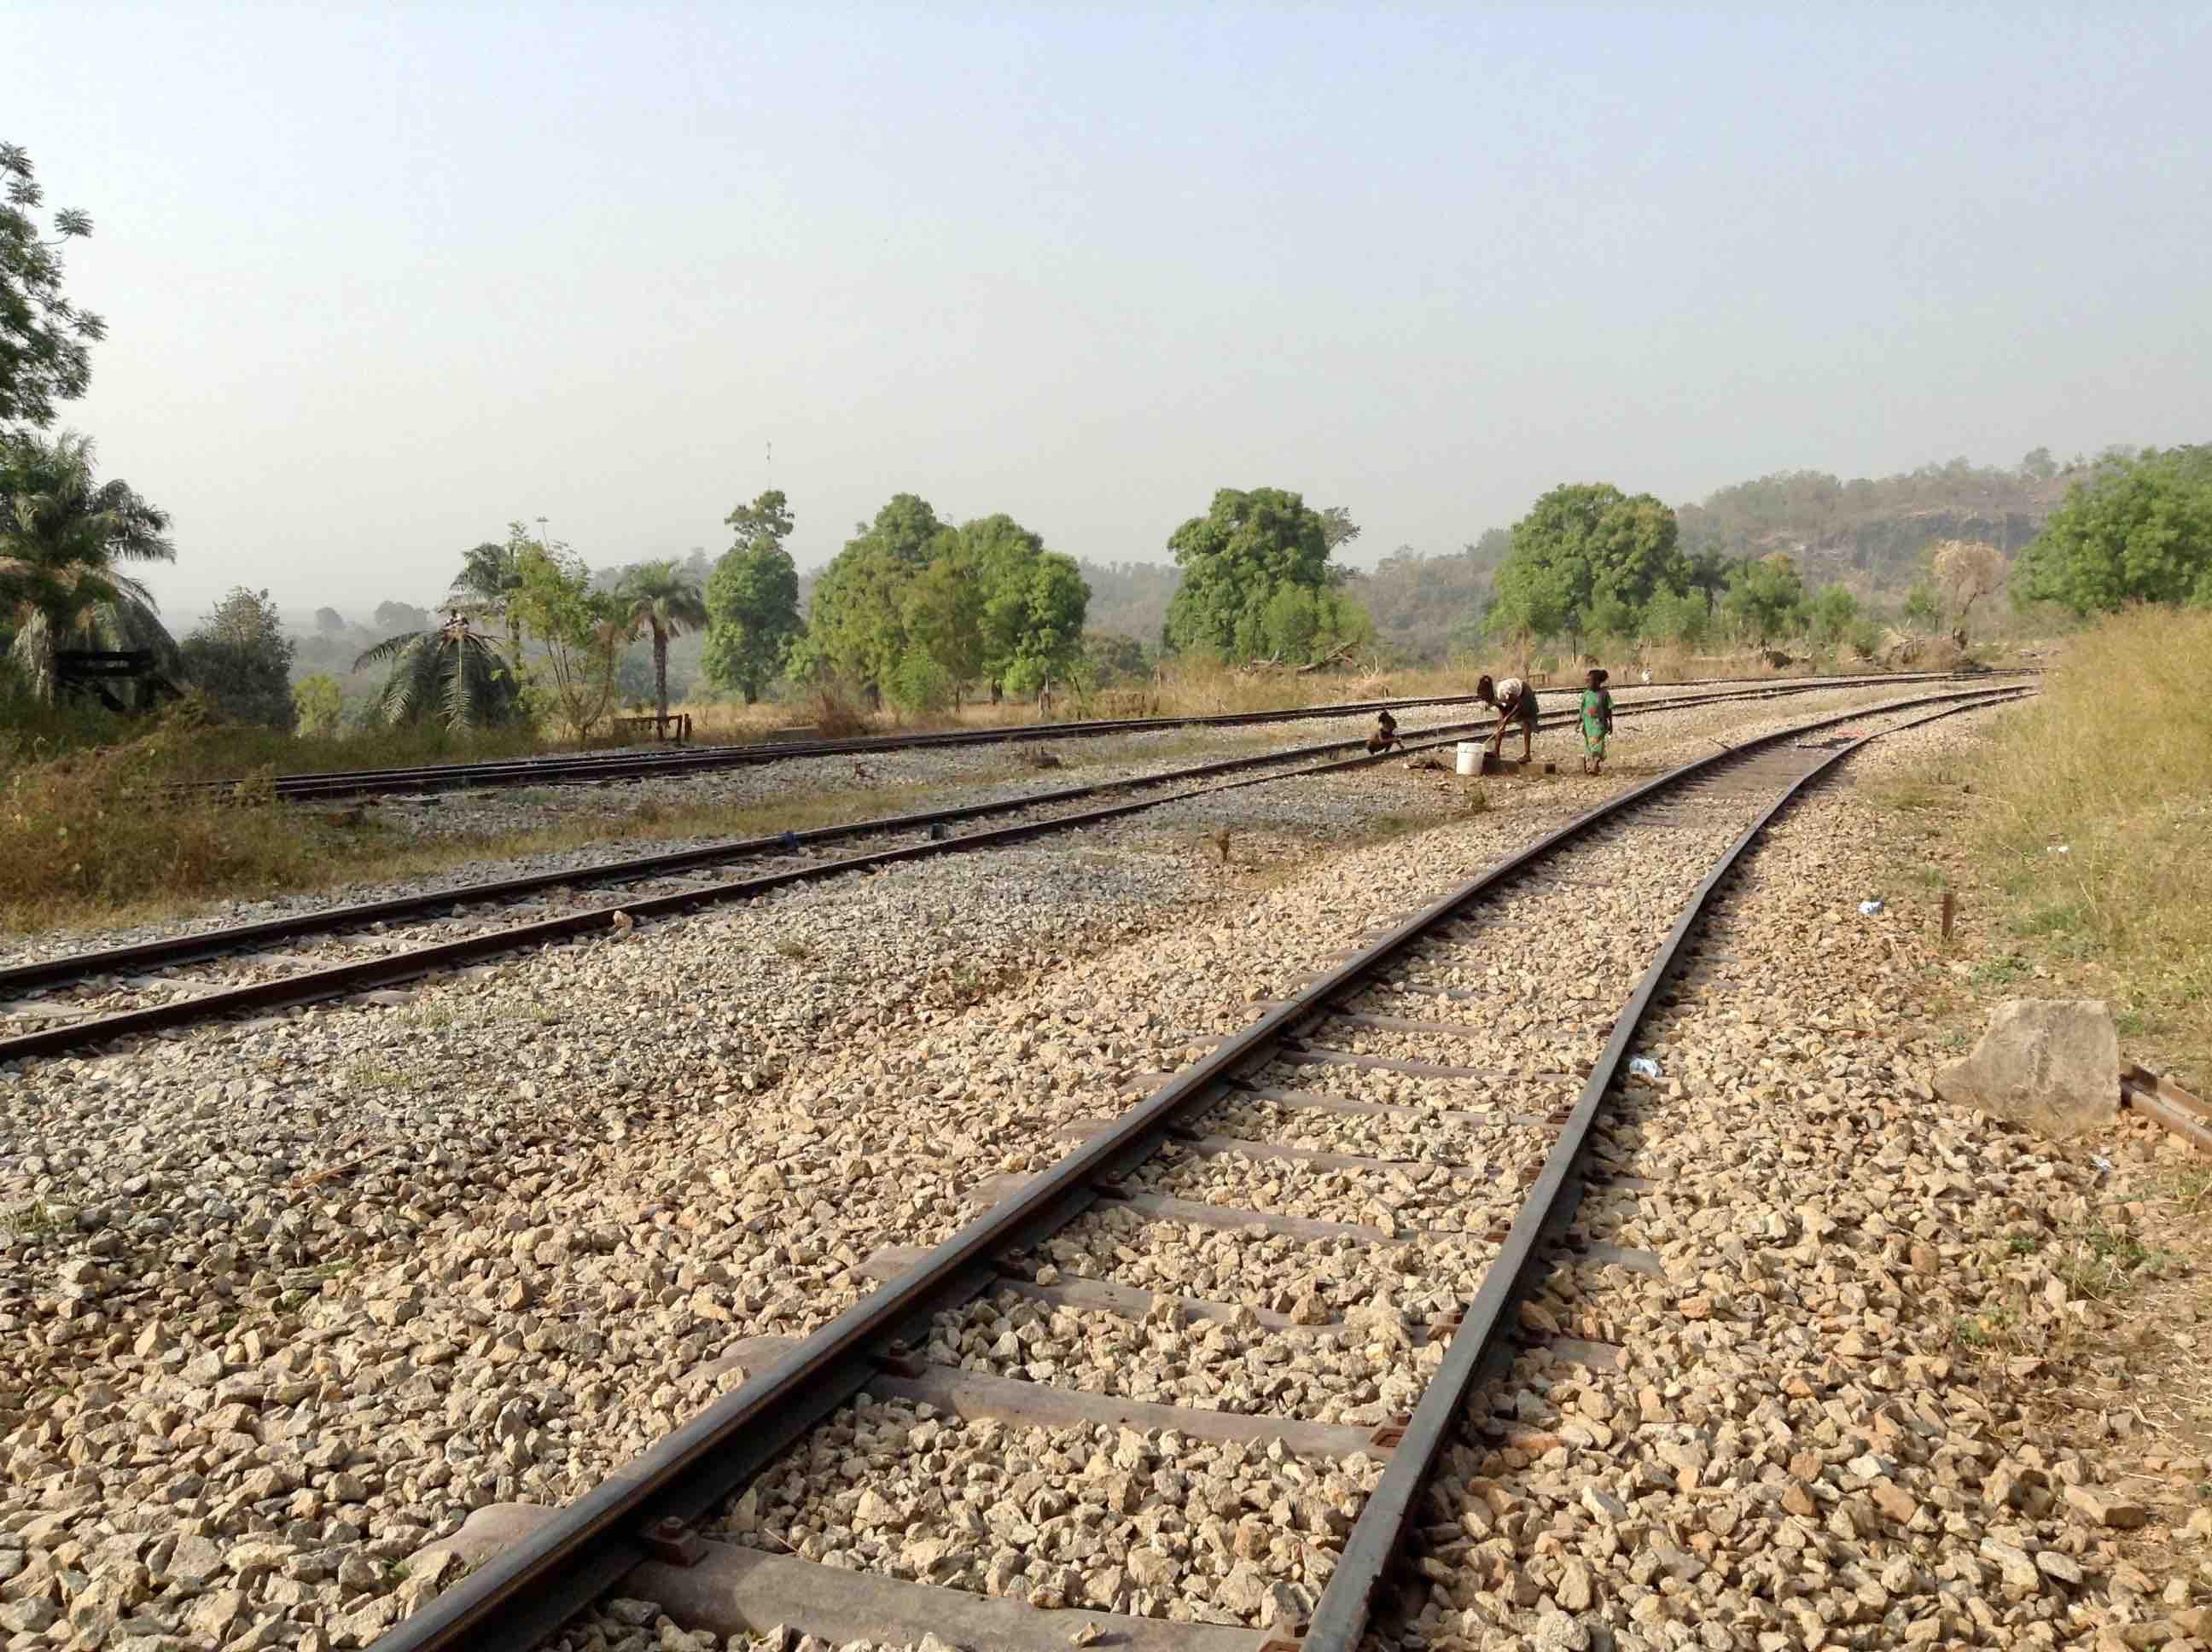 Nigerian Railways (Rail Tracks), Langa Langa, Nasarawa State, Nigeria. #JujuFilms